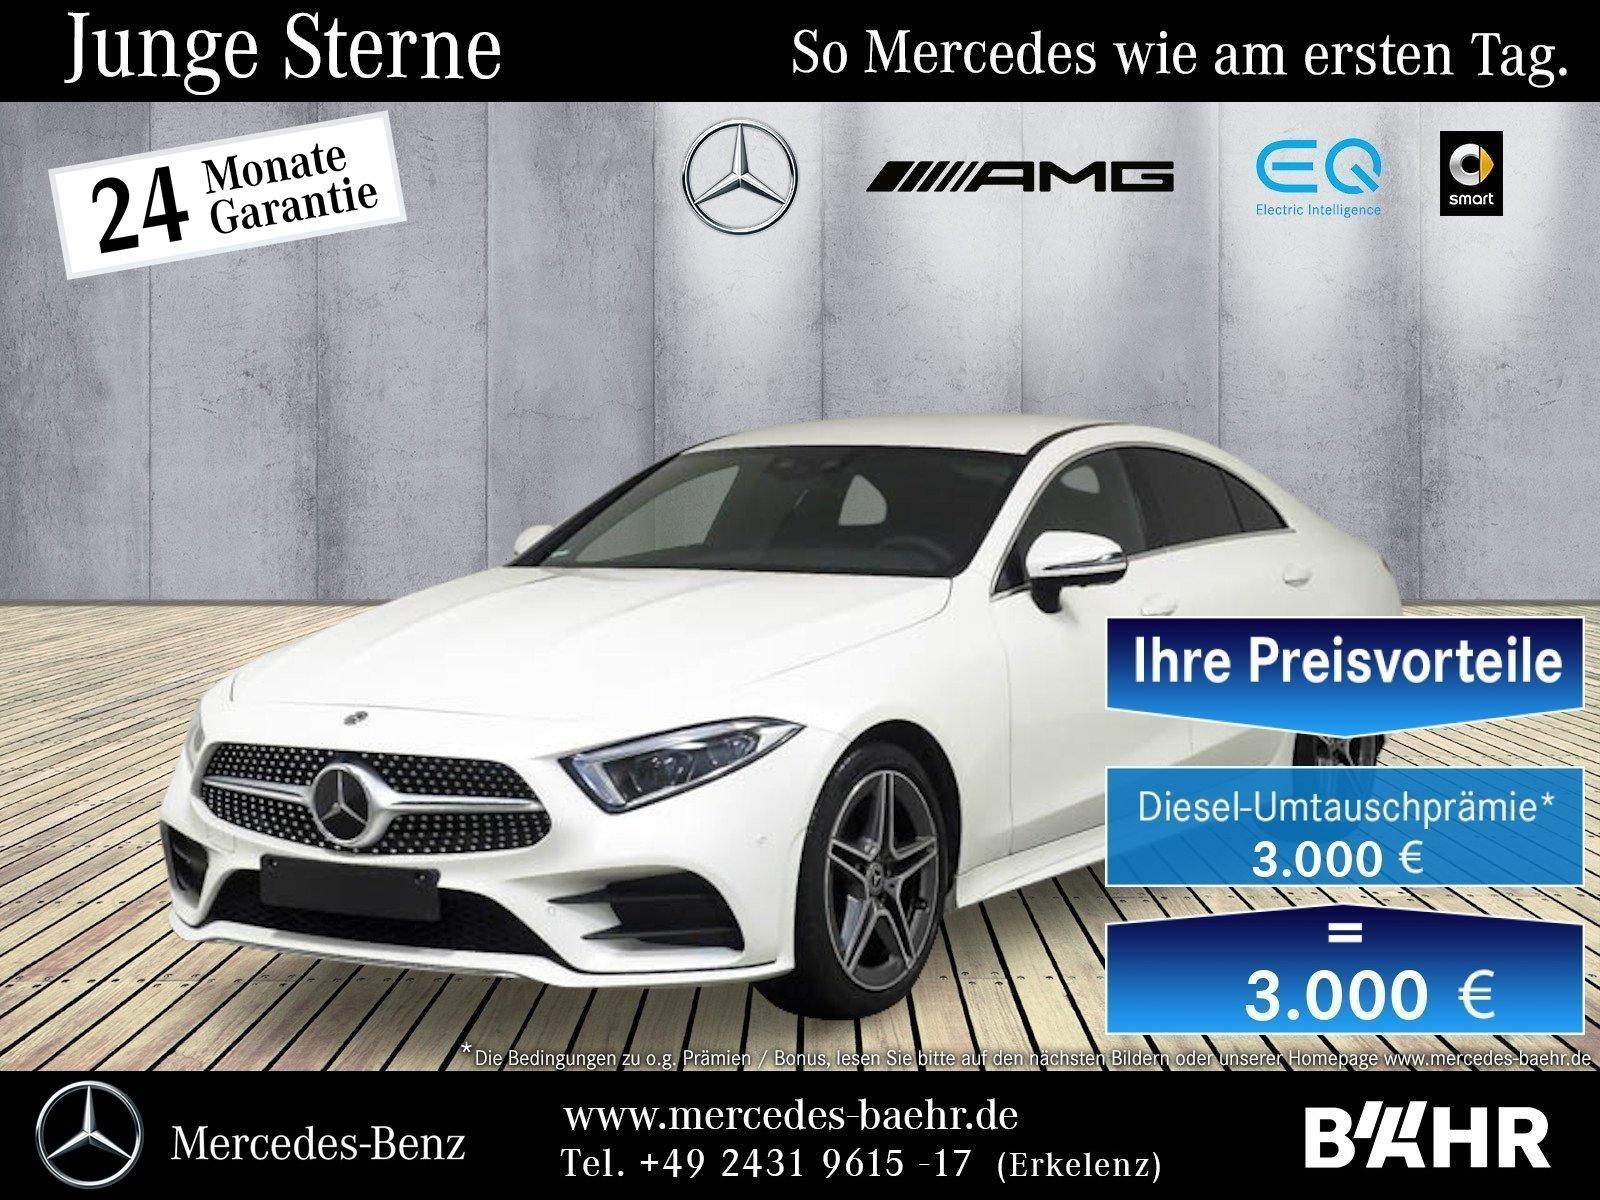 Mercedes-Benz CLS 220 d AMG/Comand/Multibeam-LED/360/Distronic, Jahr 2019, Diesel